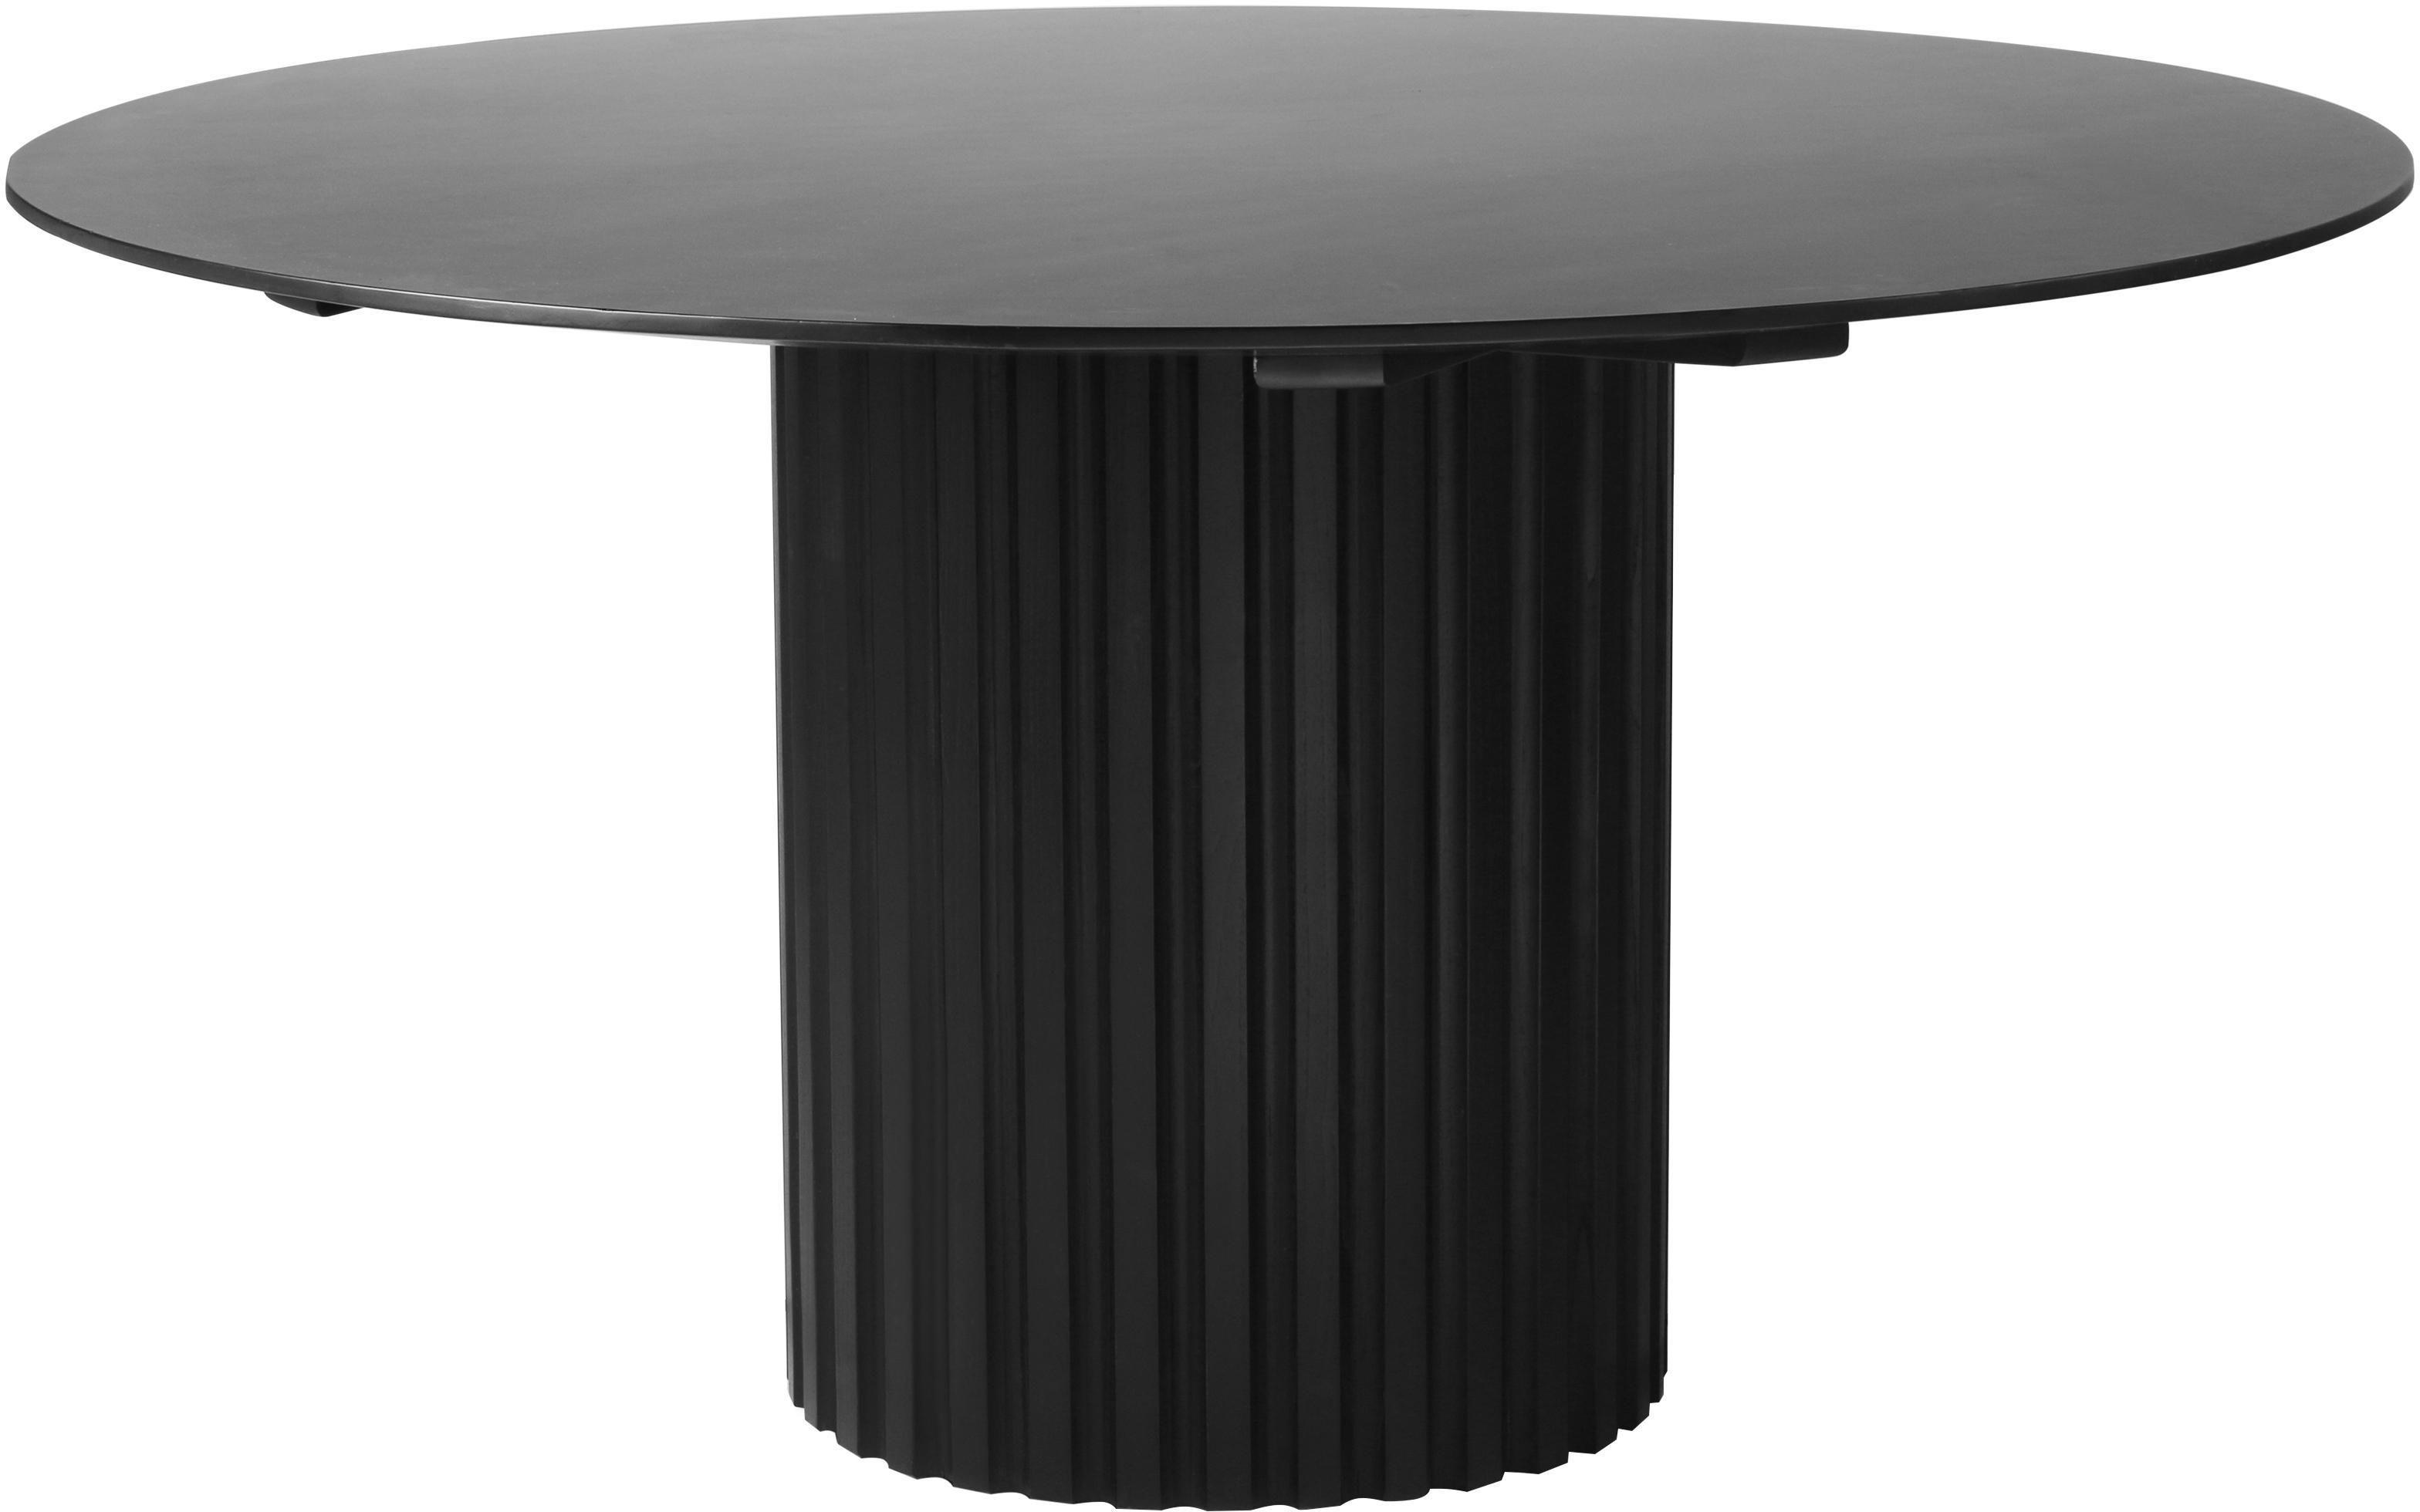 Ronde eettafel Pillar in zwart, Sungkai-hout, MDF, Zwart, Ø 140 x H 75 cm